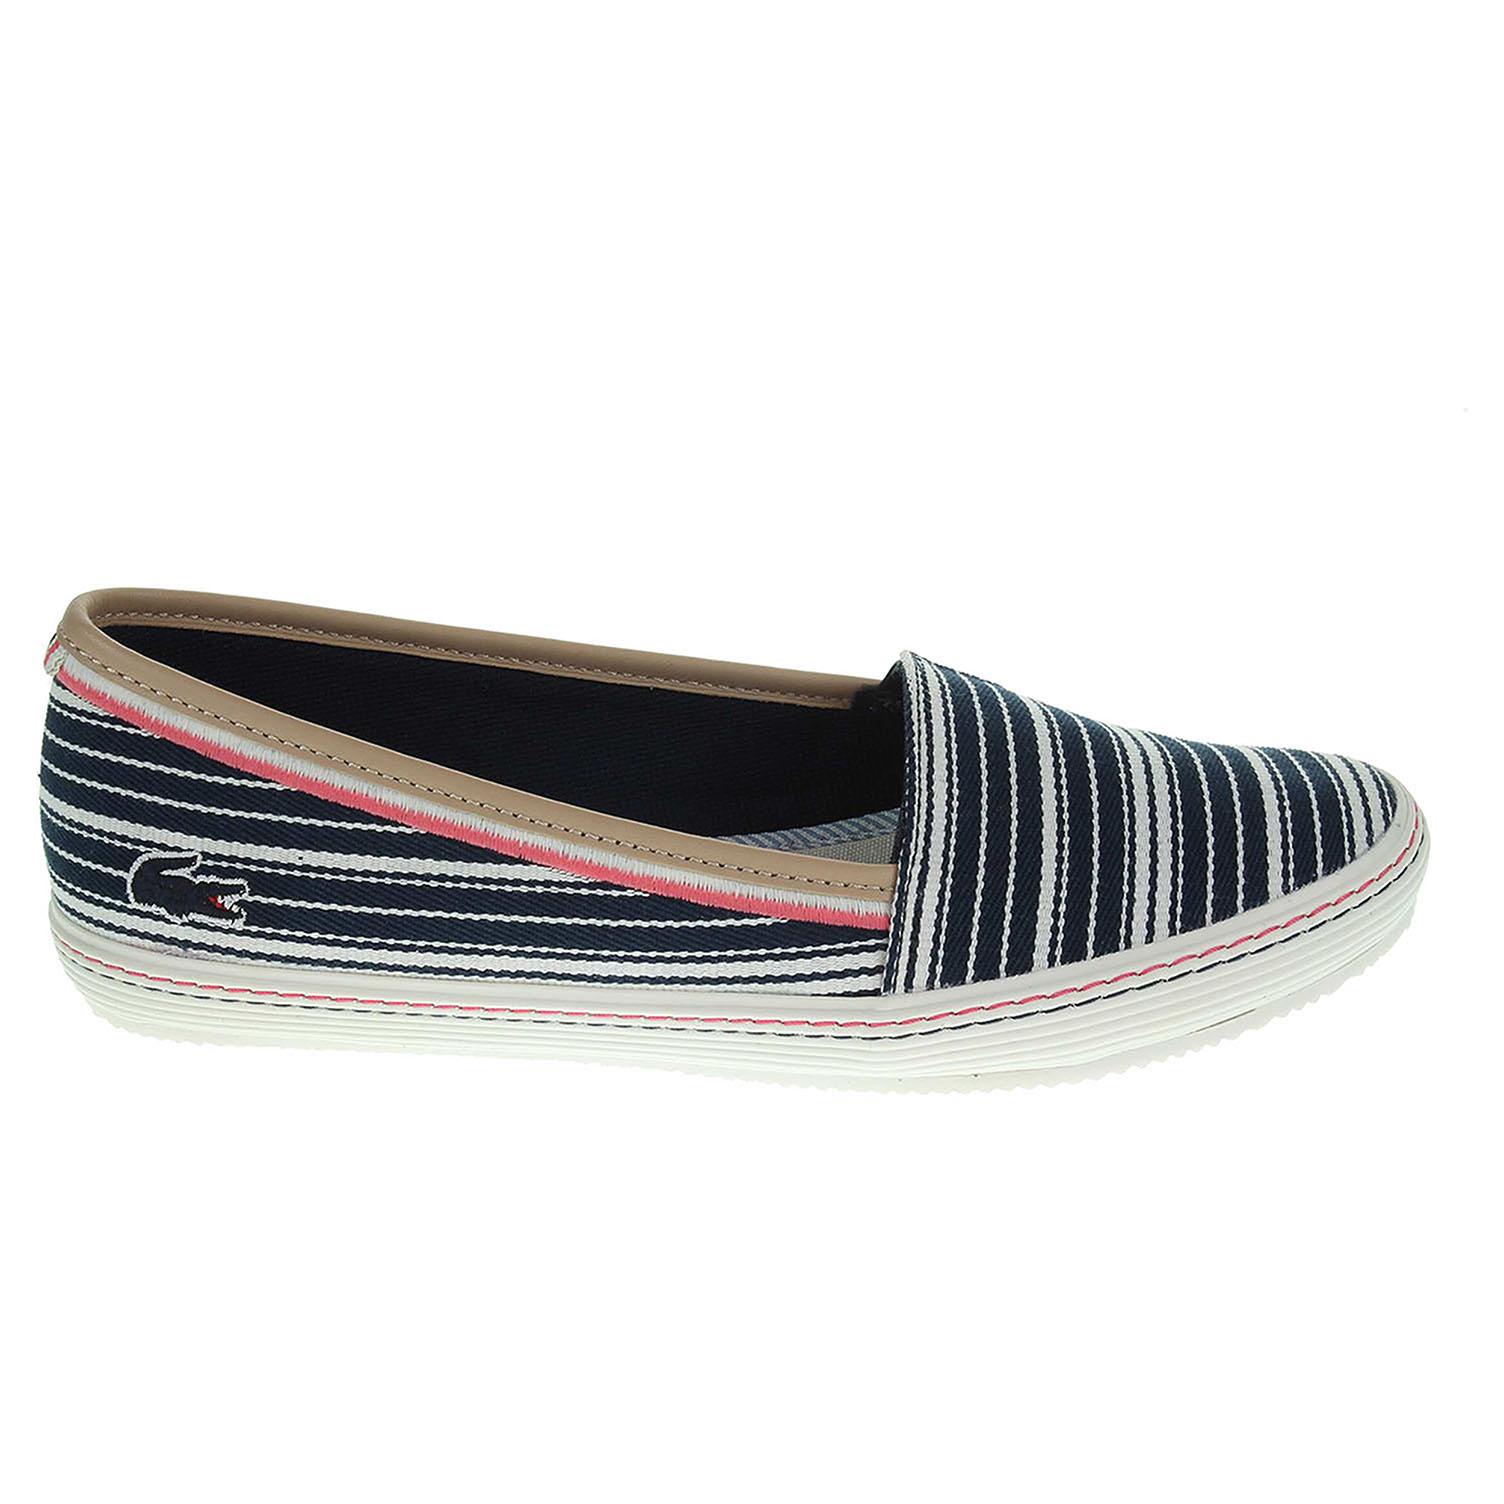 Lacoste Orane dámská obuv modrá 38